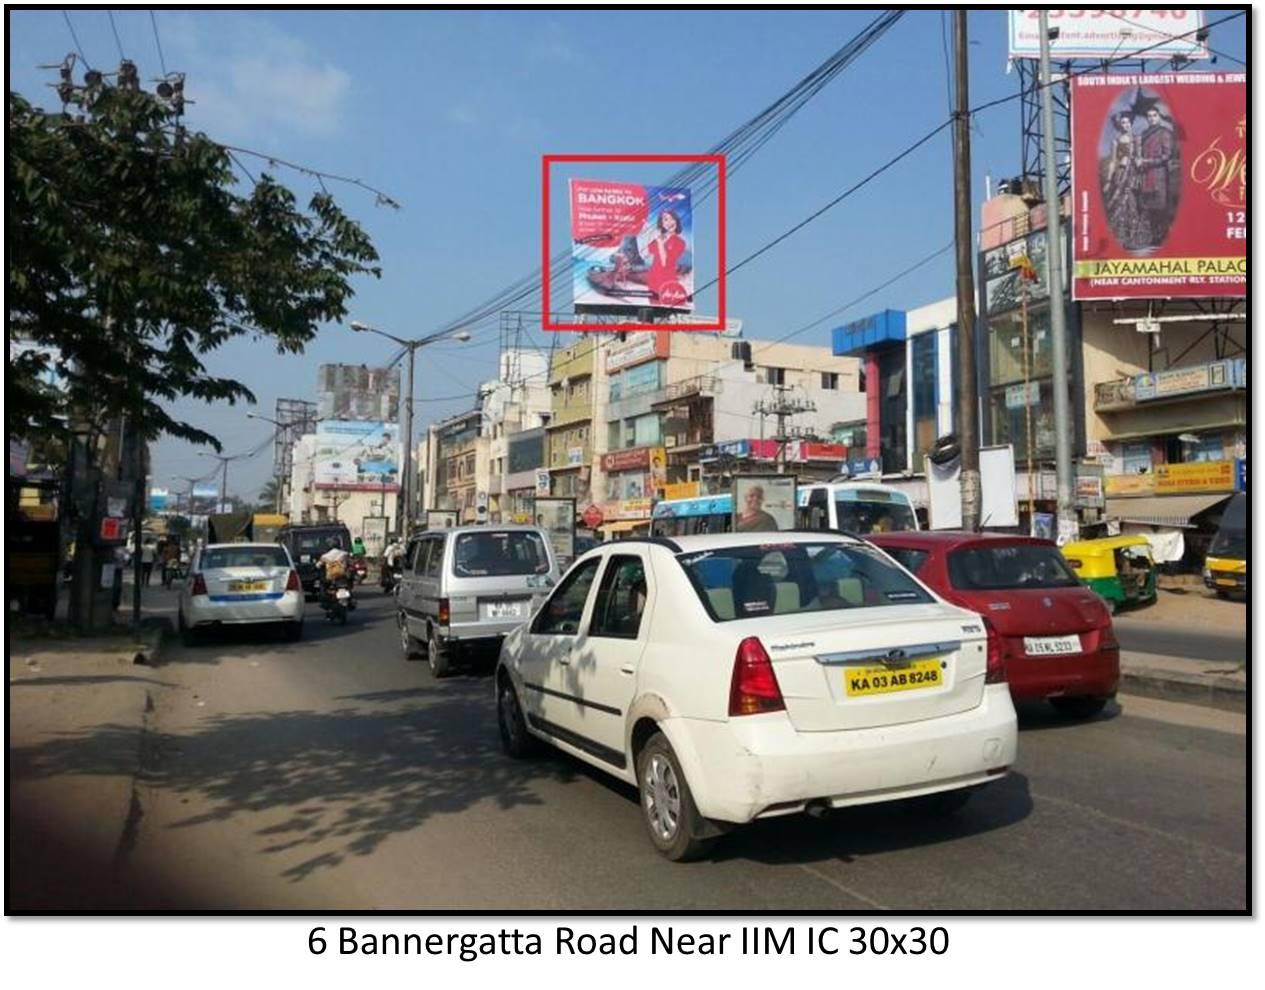 Bannergatta Road Near IIM, Bengaluru